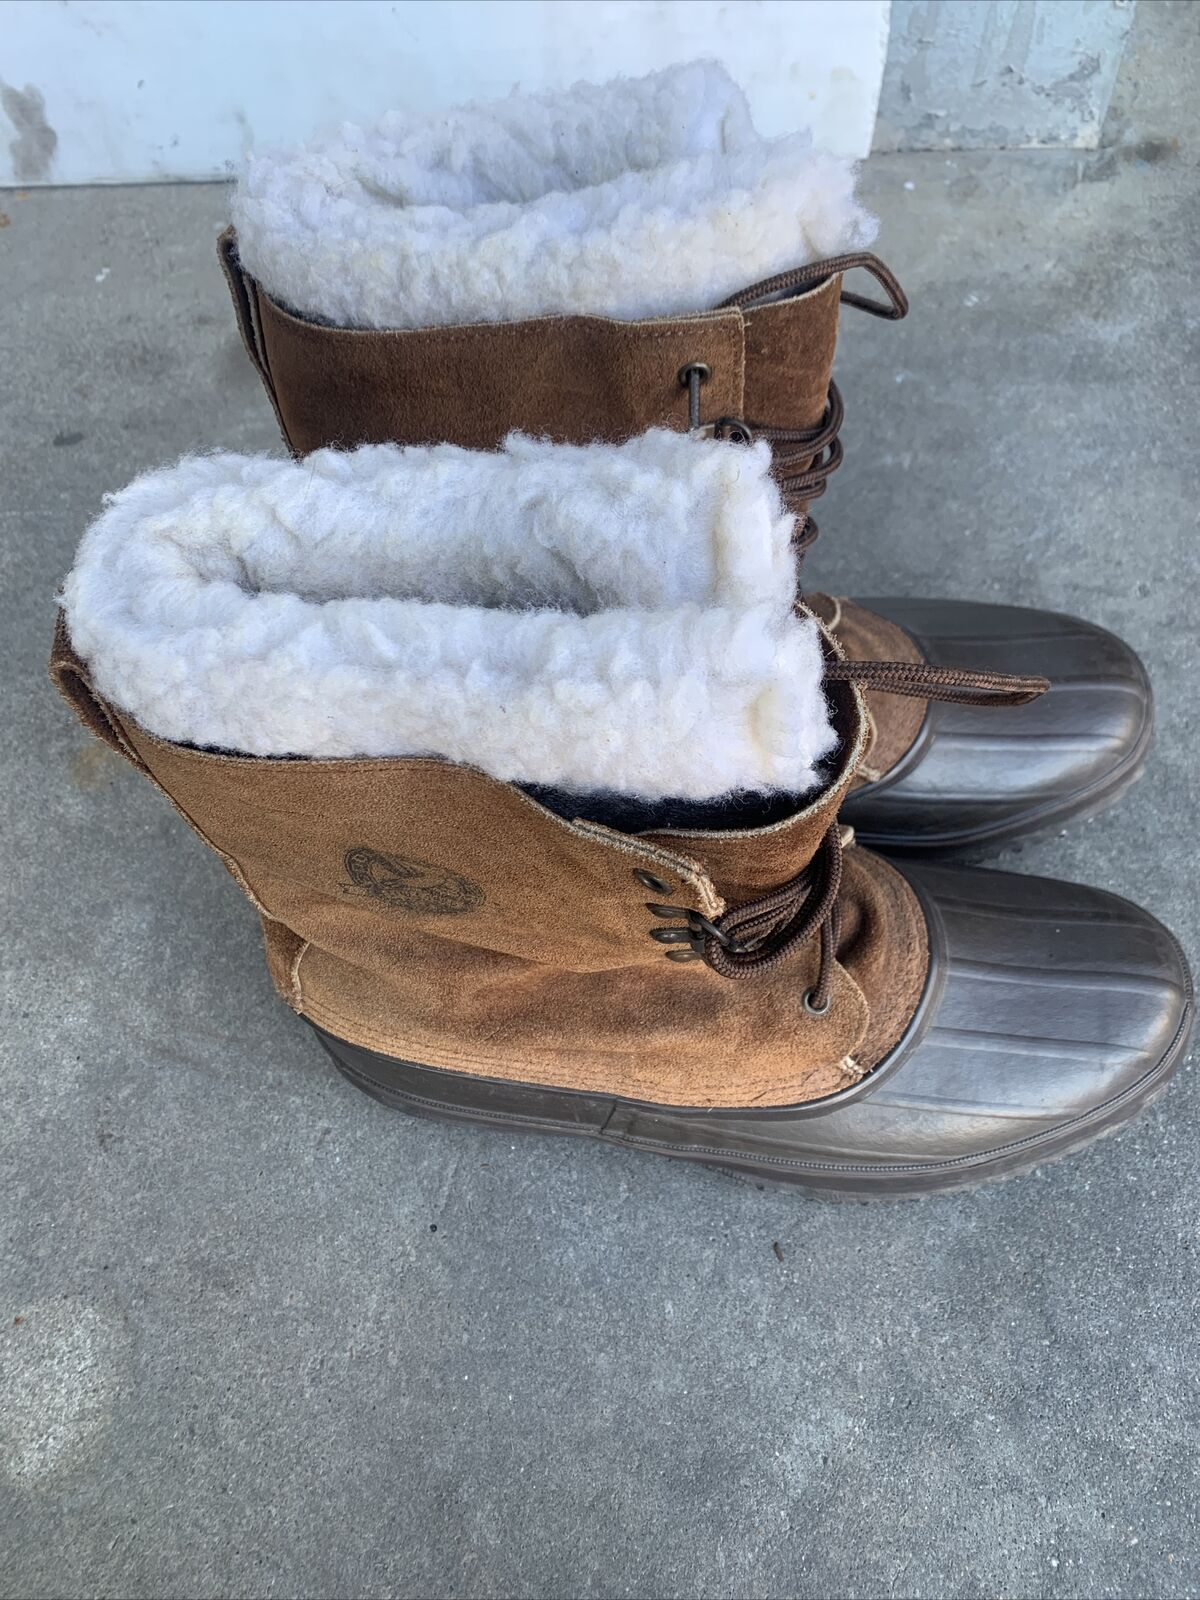 Eddie Bauer U.S.A. Brown Suede Faux Fur Fiberglass Shank Boots Men's U.S. Size12